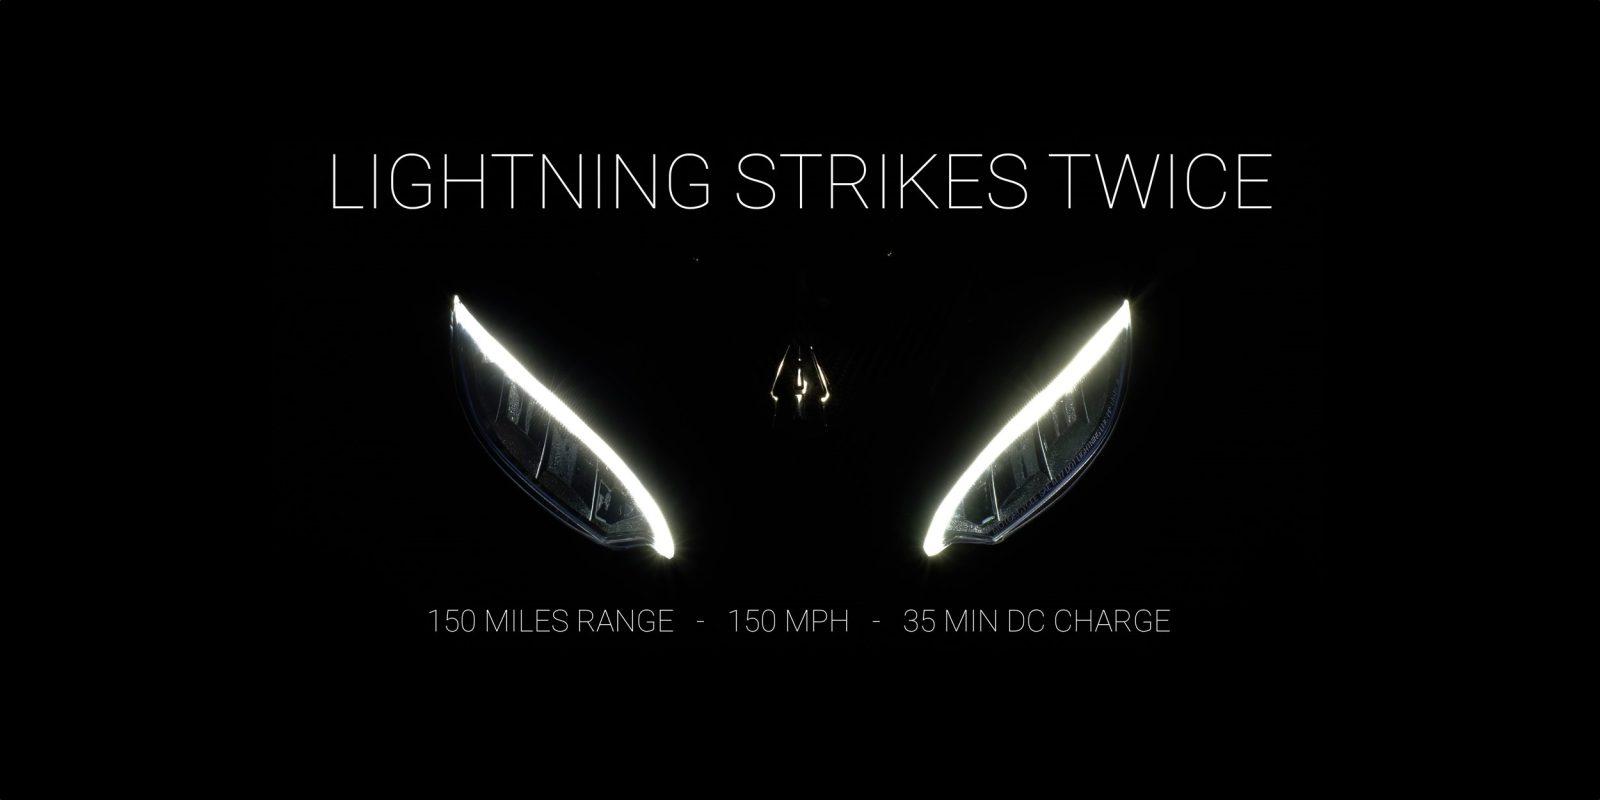 Lightning Stike la superbike elettrica tra le novità moto 2019